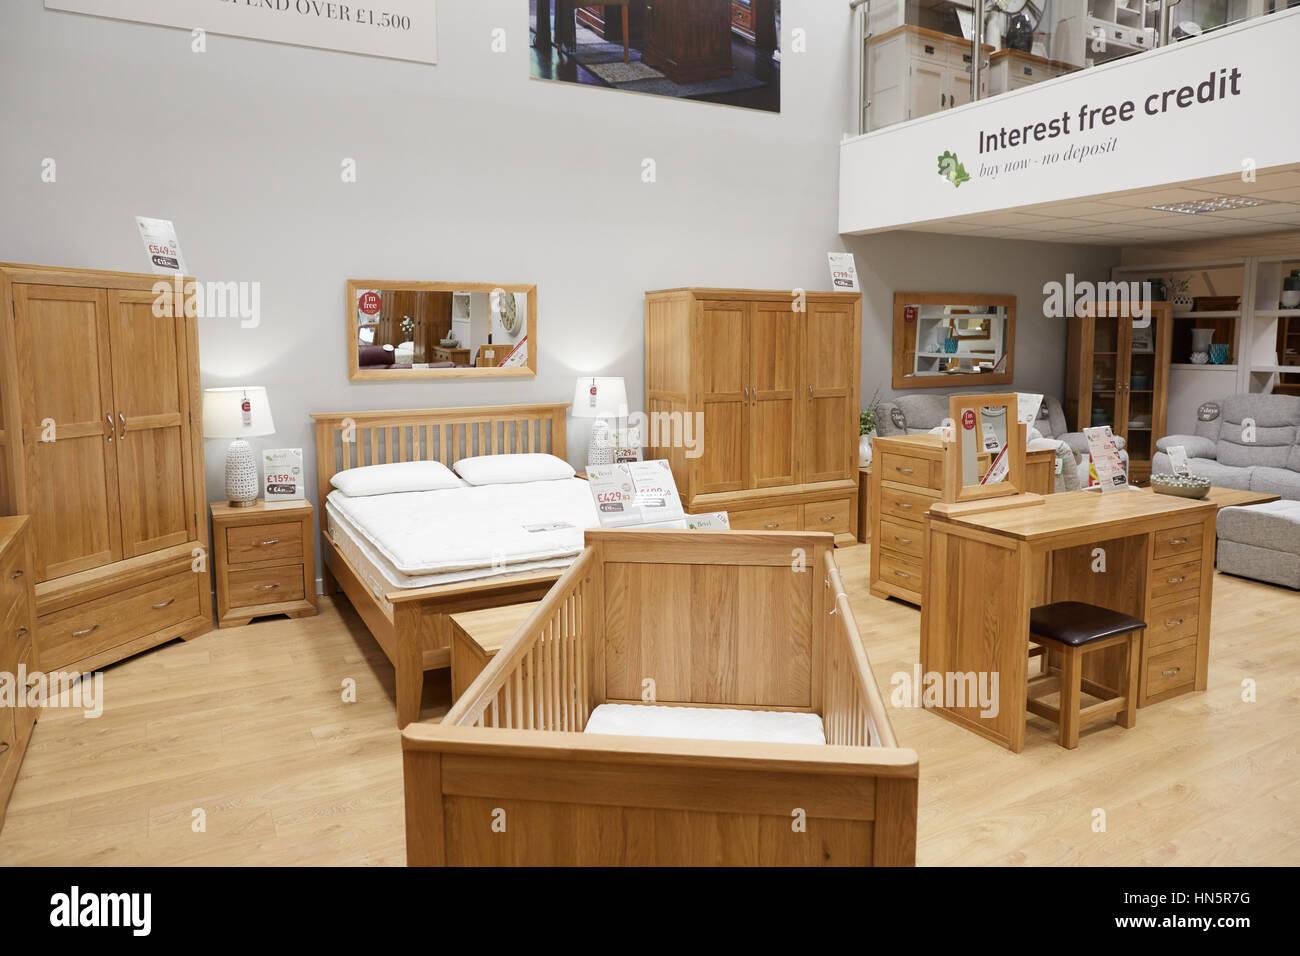 Oak Furniture Land Store Stock Photos Oak Furniture Land Store